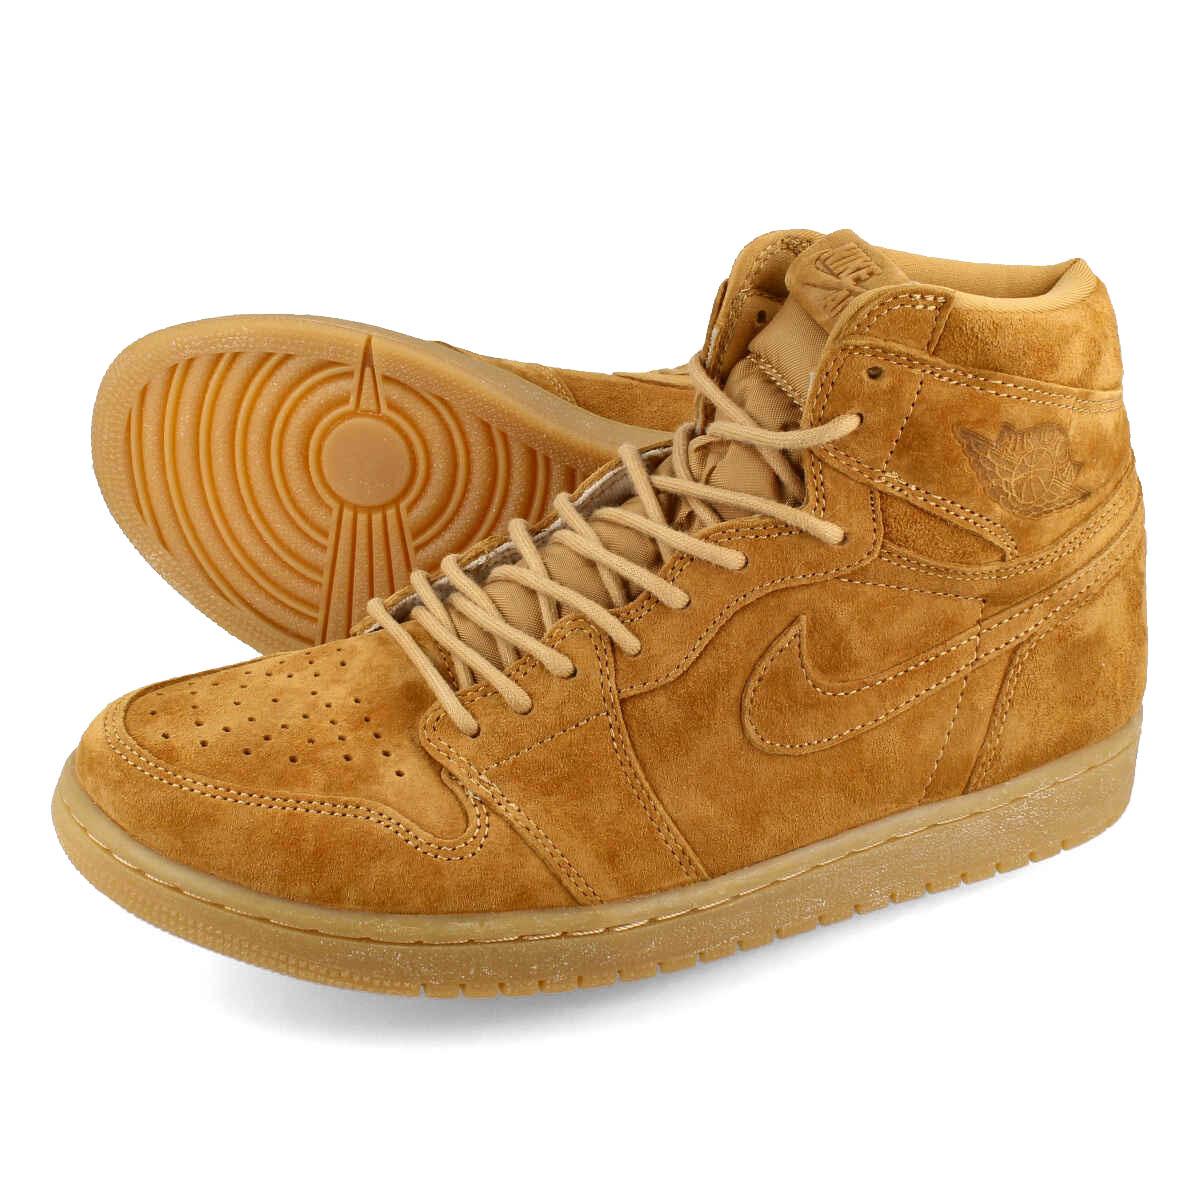 4ea267109293 NIKE AIR JORDAN 1 RETRO HIGH OG Nike Air Jordan 1 nostalgic high OG GOLDEN  HARVEST ELEMENTAL GOLD 555